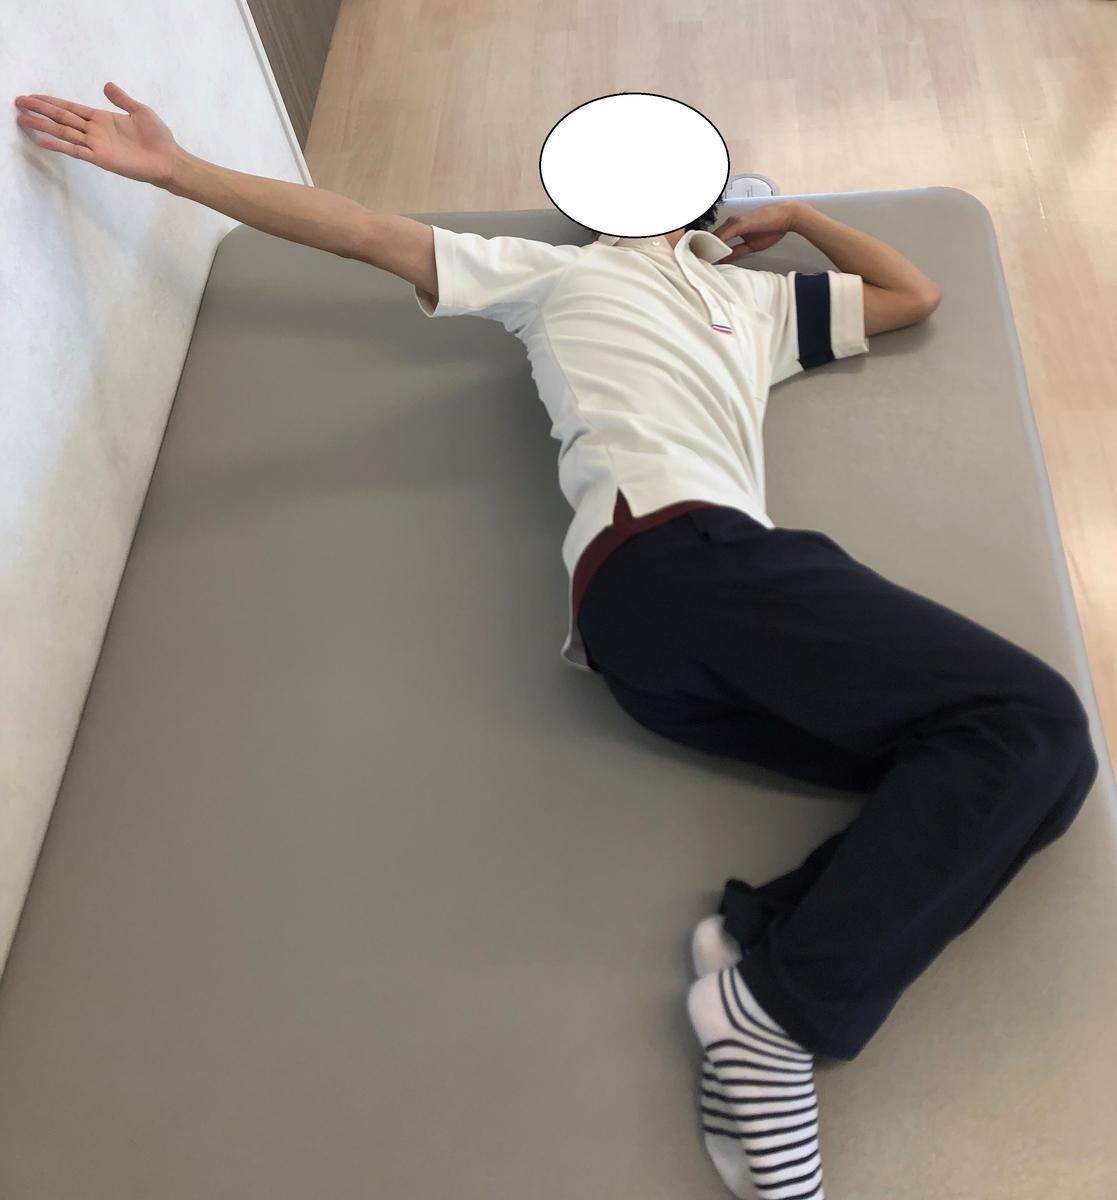 f:id:asohiro:20190905000209j:plain